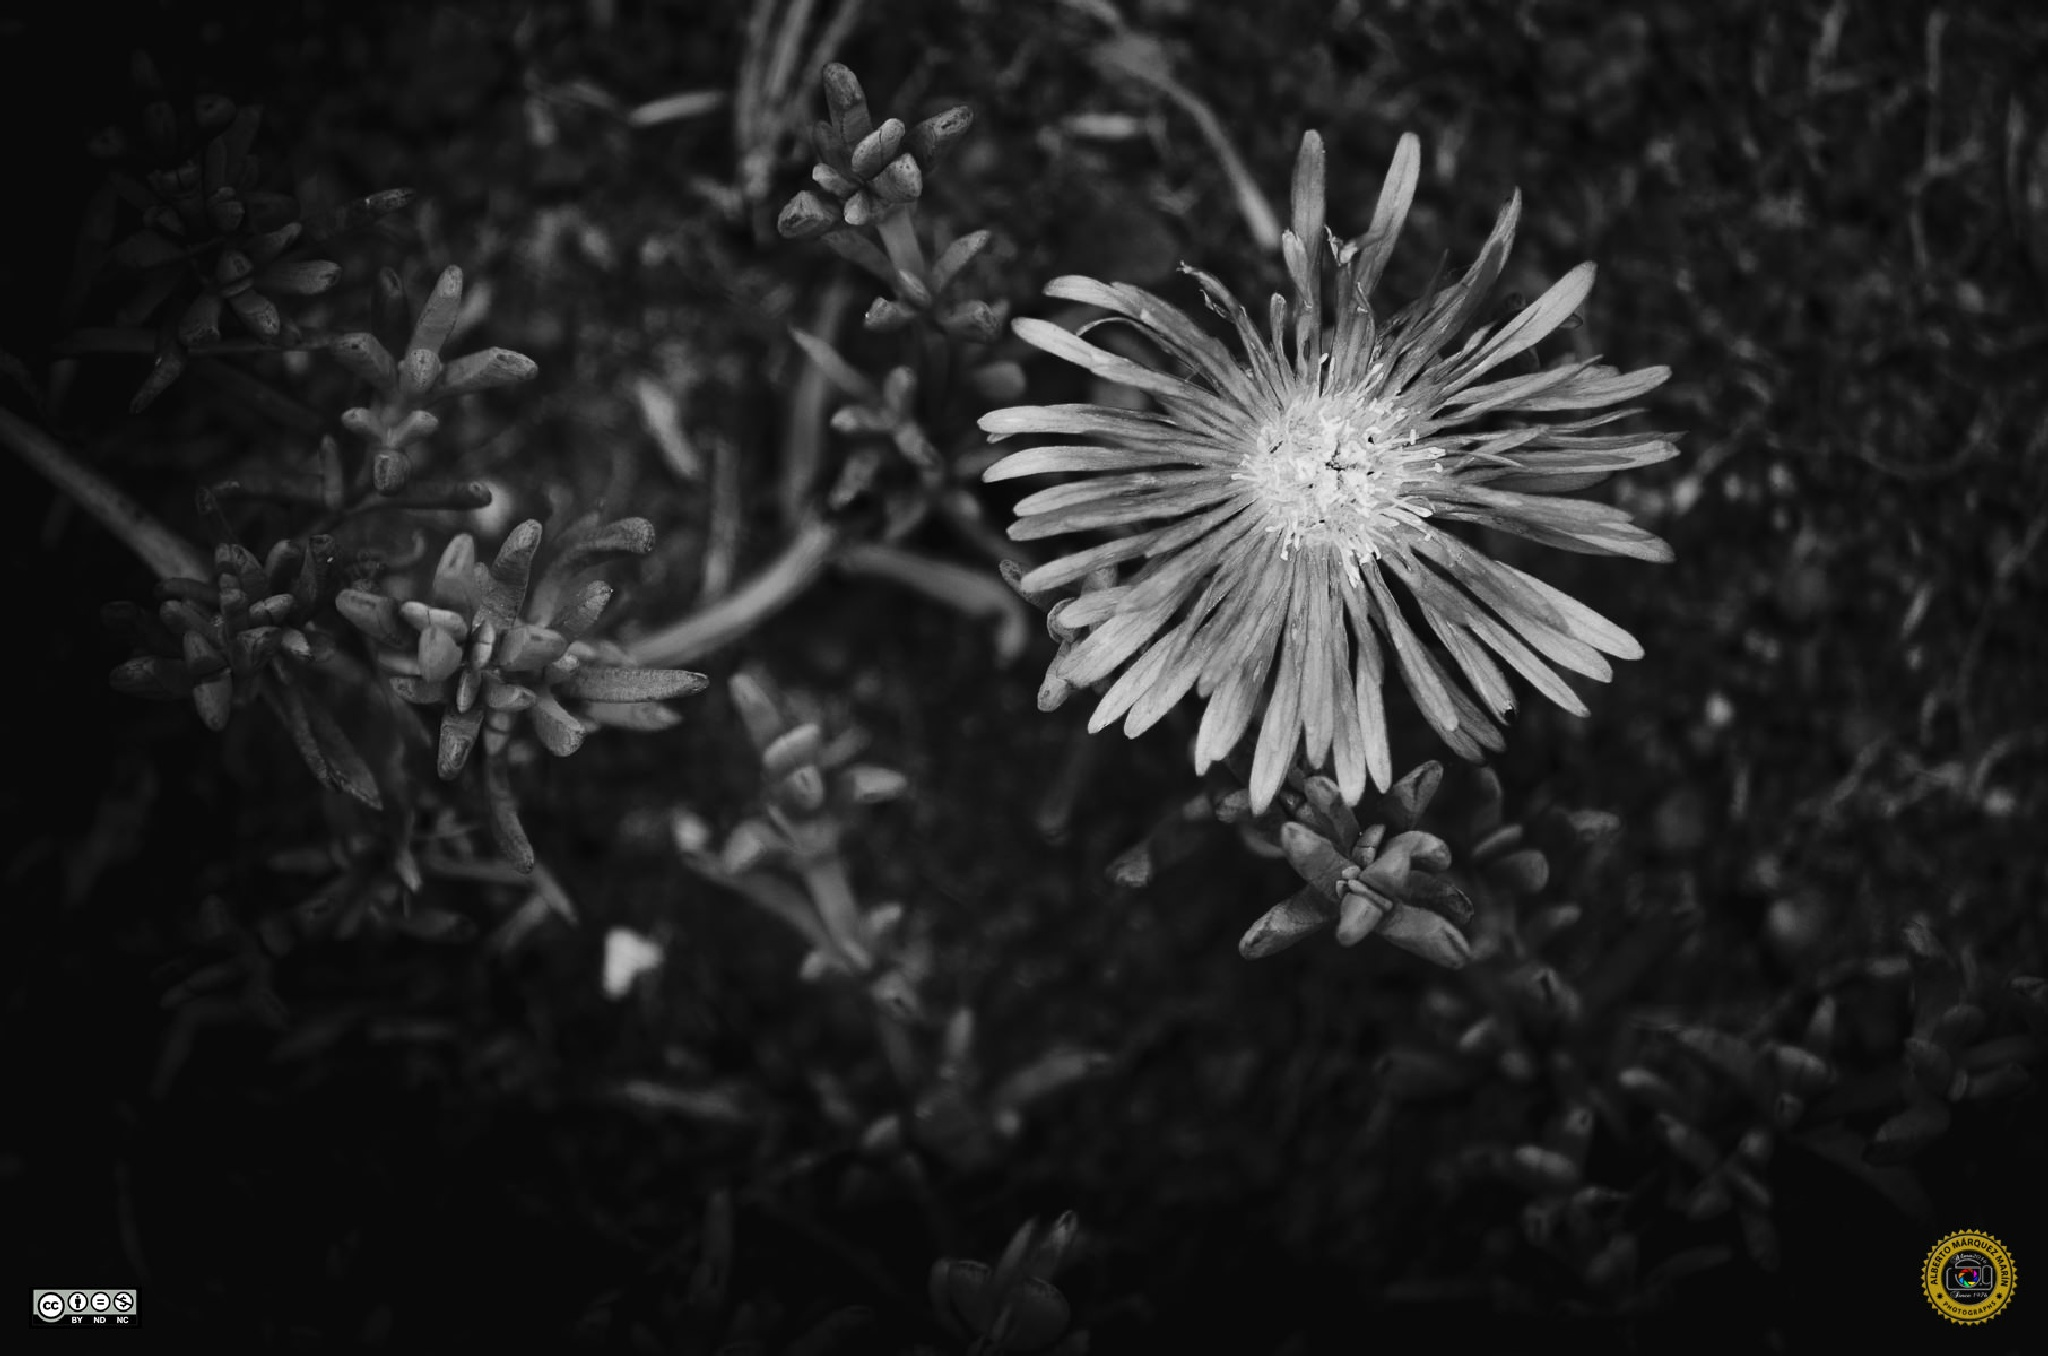 BW flower by Alberto Márquez Marín